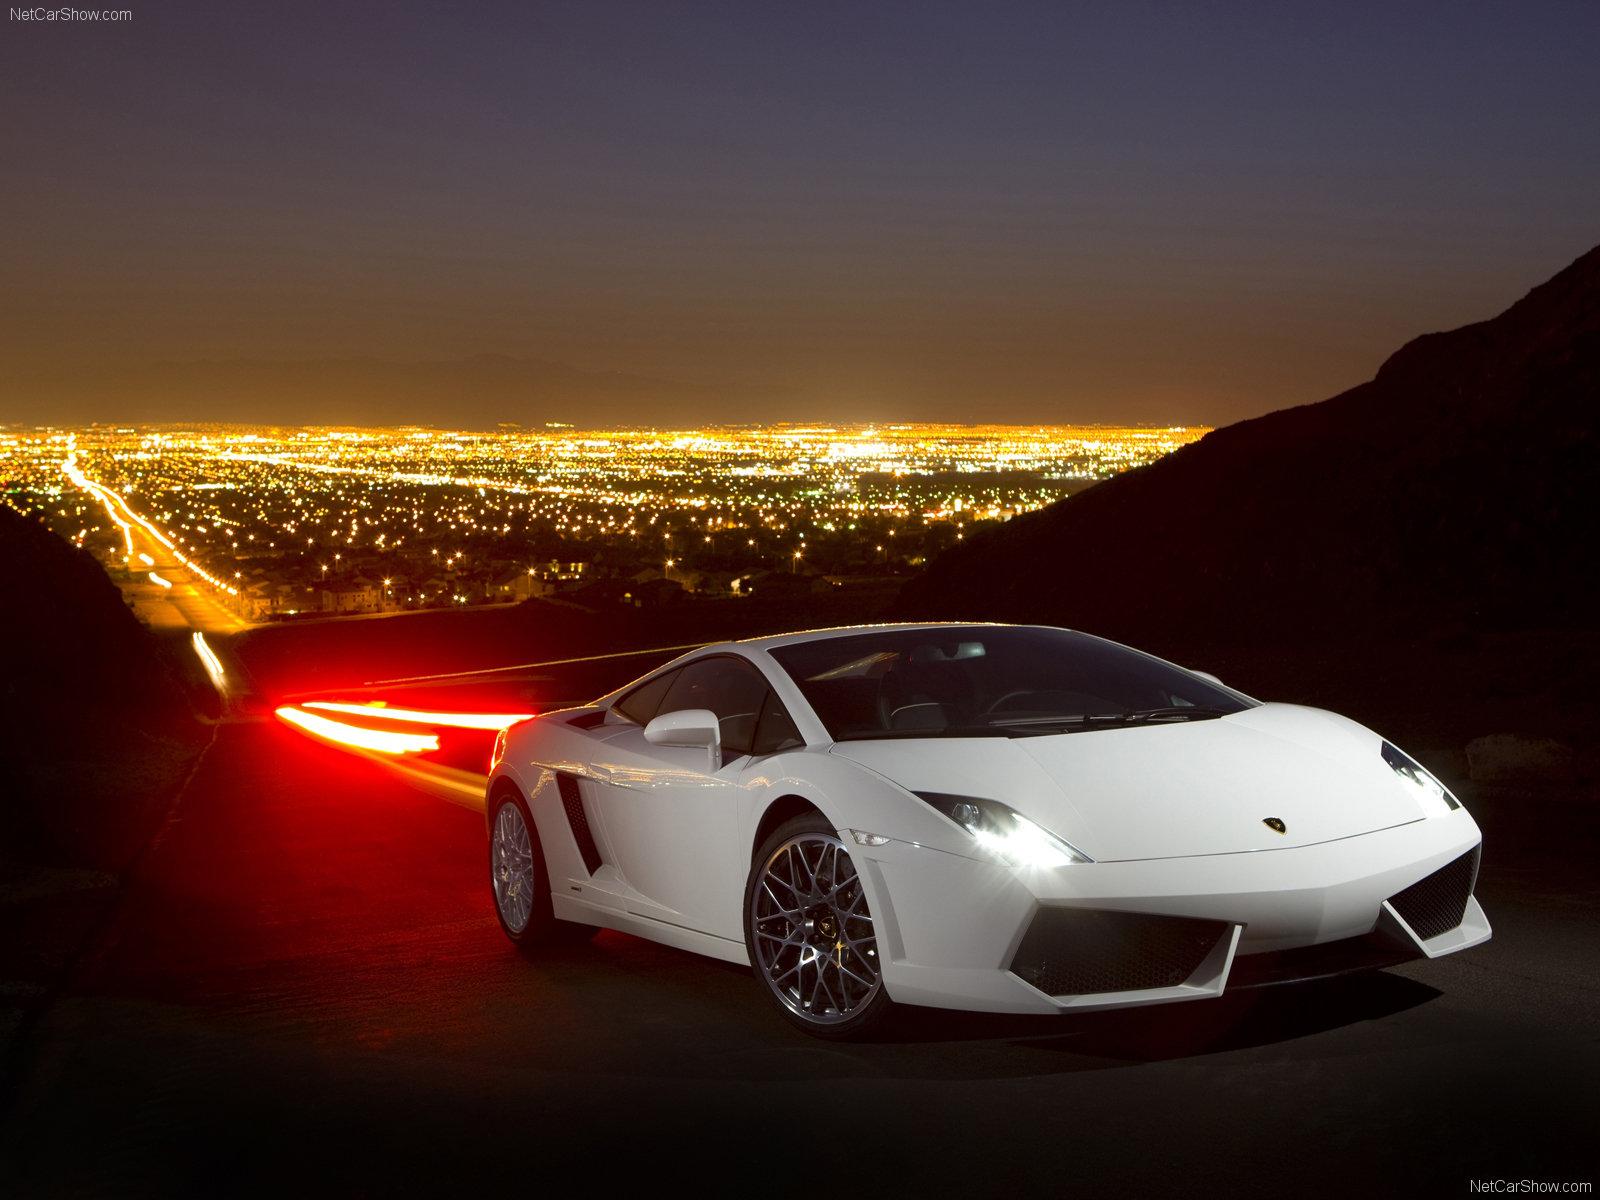 Mazda Furai Vehículos Supercars Hd Fondos De Pantalla: Lamborghini Gallardo Wallpapers For Windows 8